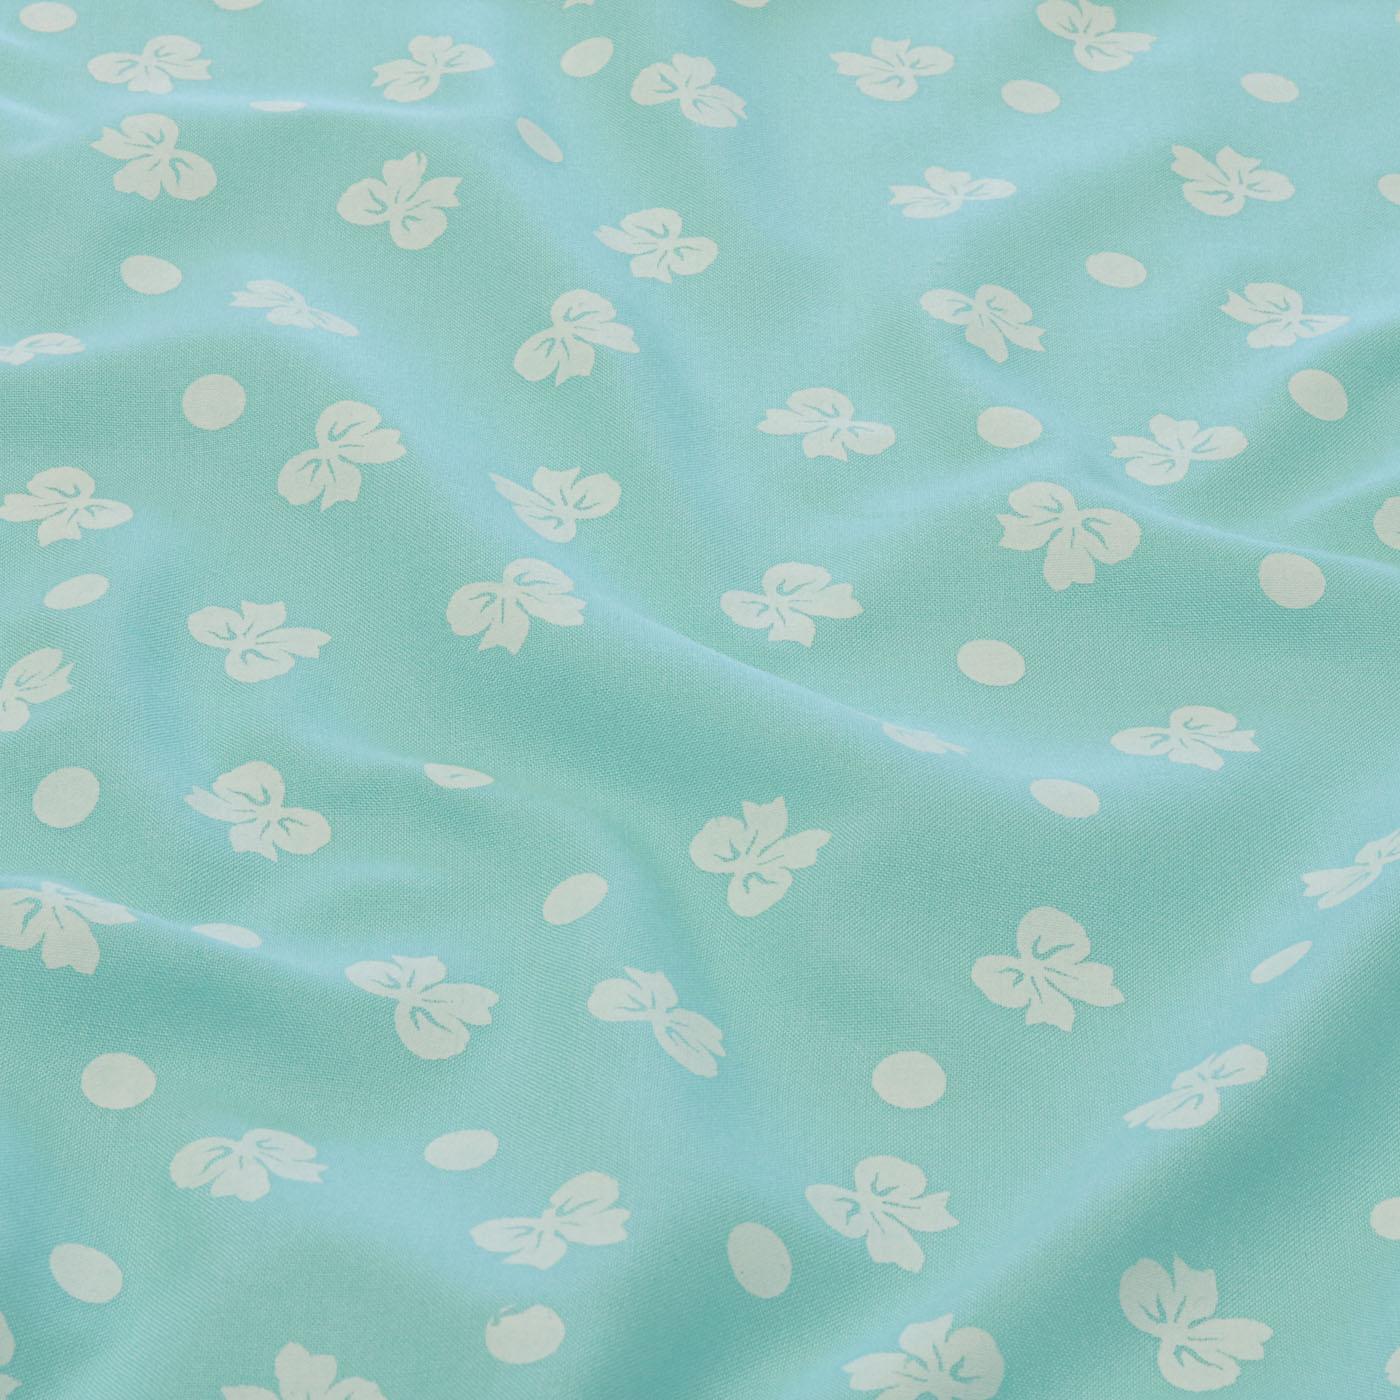 Tecido Viscose Estampado Laços 100% Viscose Azul Claro